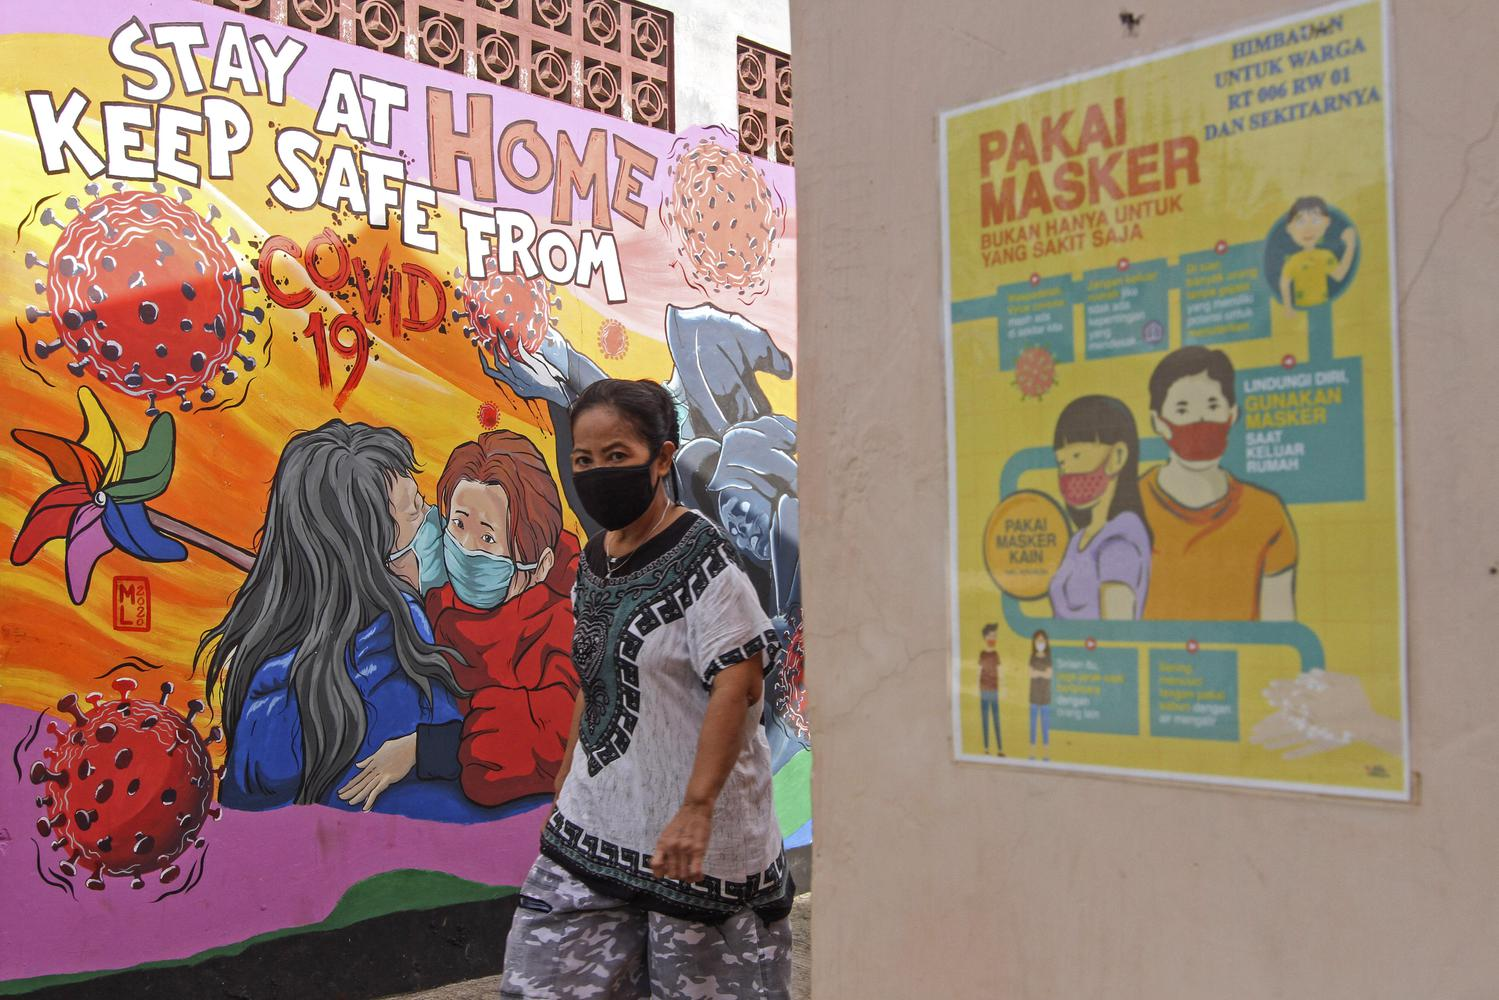 Seorang warga melintas di depan mural tentang COVID-19 di Pangkalan Jati Baru, Depok, Jawa Barat, Selasa (26/5/2020). Pembatasan Sosial Berskala Besar (PSBB) wilayah Kota dan Kabupaten Bogor, Depok, Kota dan Kabupaten Bekasi (Bodebek) untuk sementara diperpanjang hingga Jumat (29/5/2020) menyelaraskan diri dengan periode PSBB Jawa Barat.